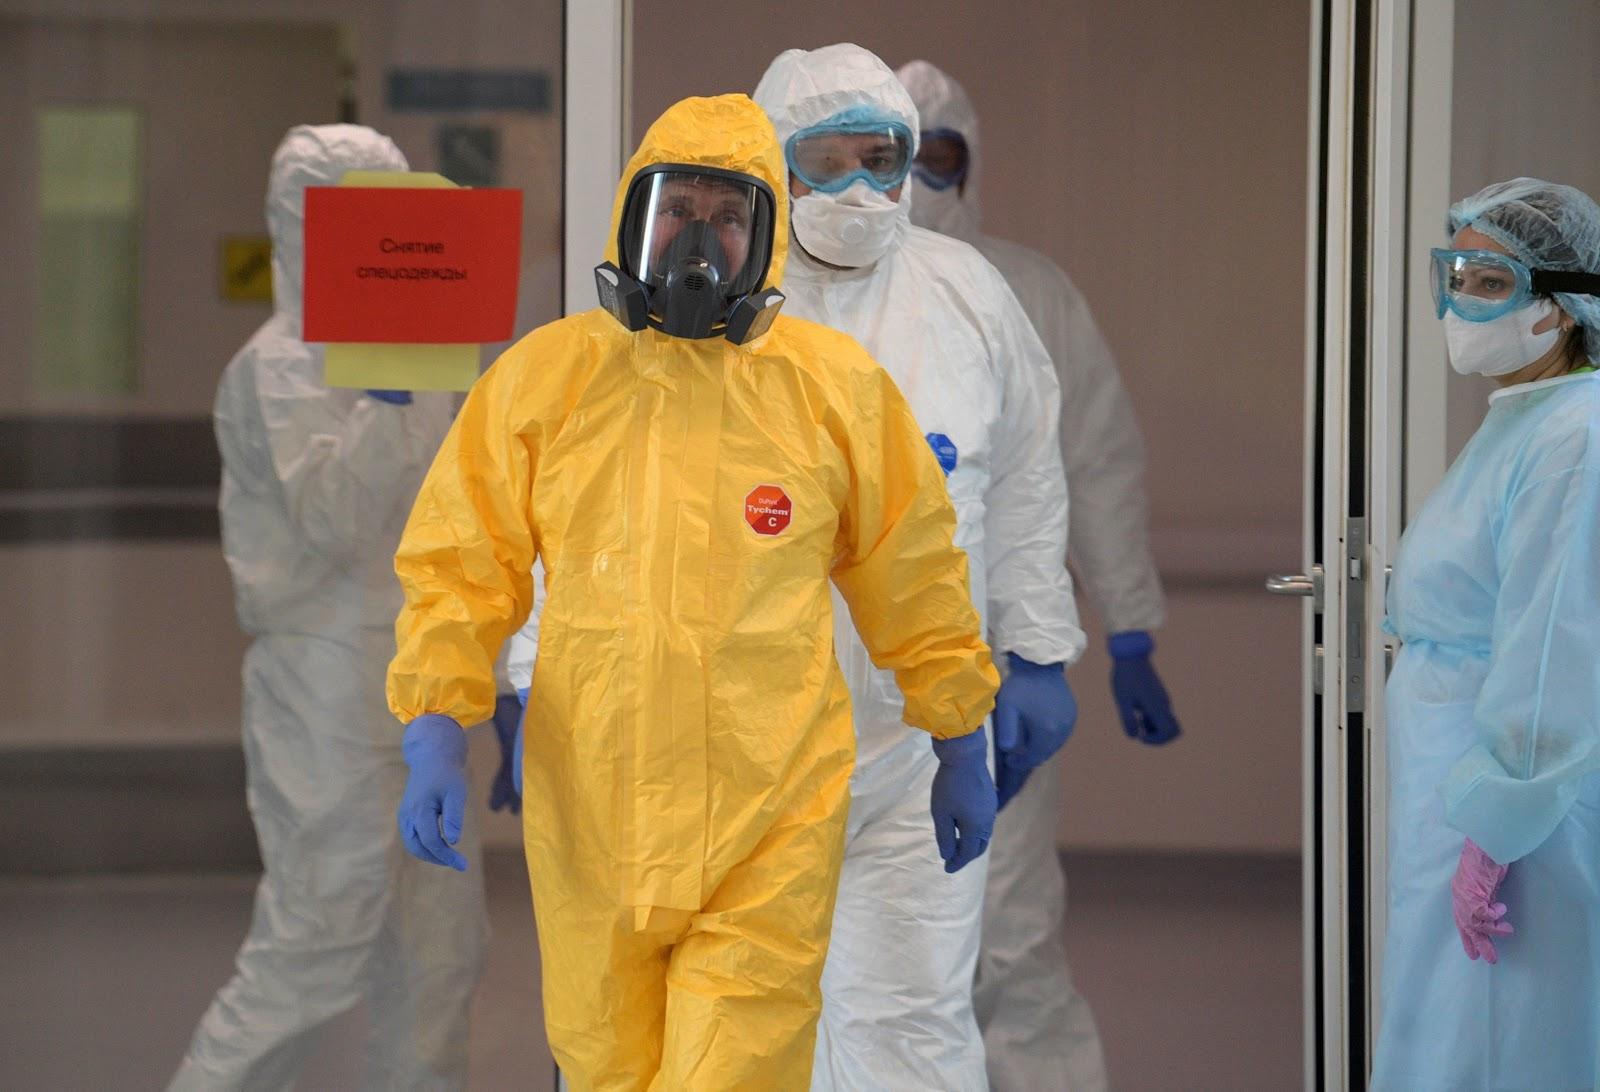 Putin Visits Hospital To Assess COVID-19 Crisis